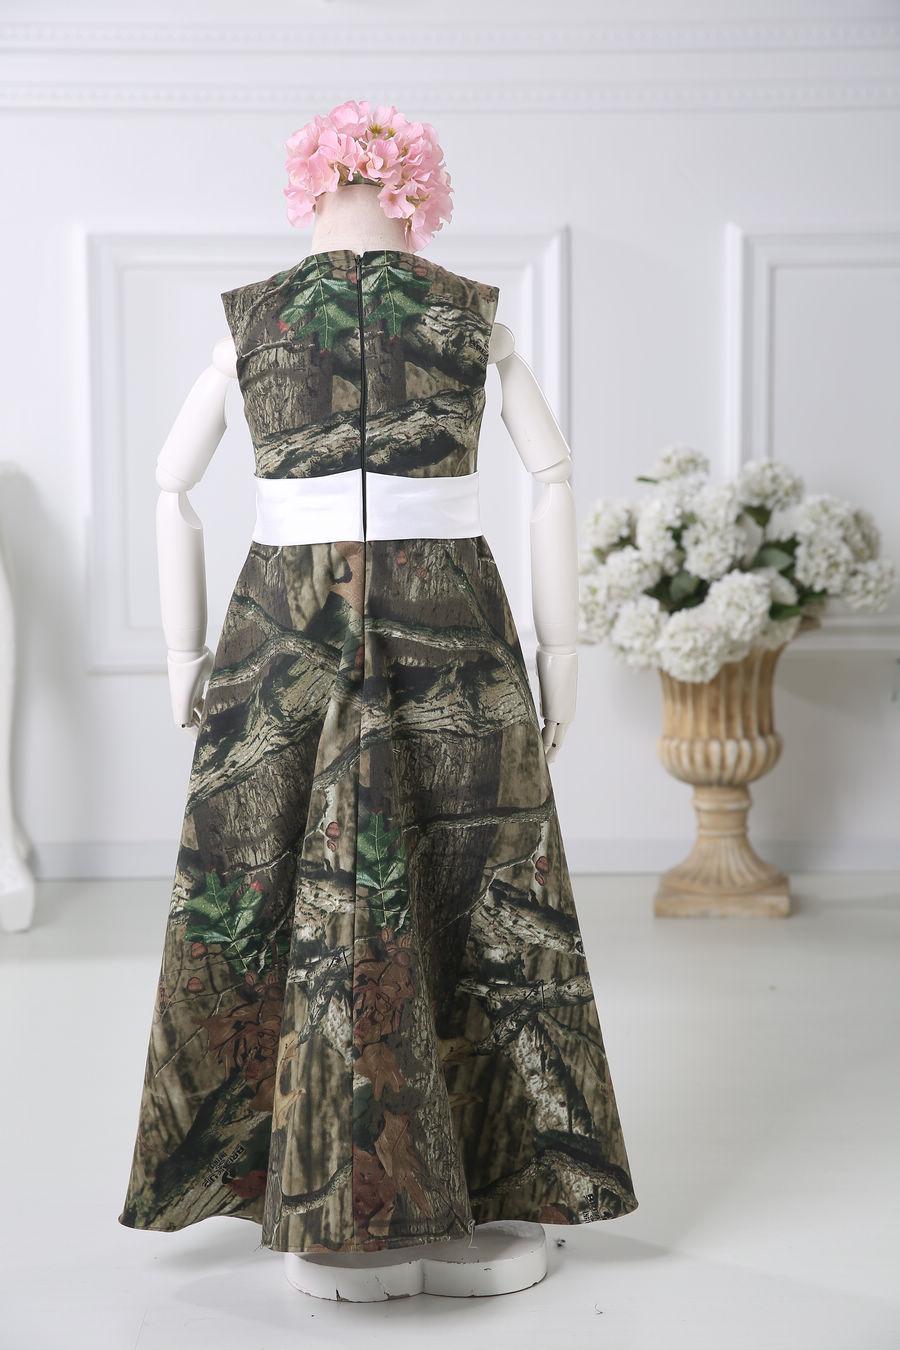 c56a97fa295 Camouflage Flower Girl Dresses Custom Size on Storenvy